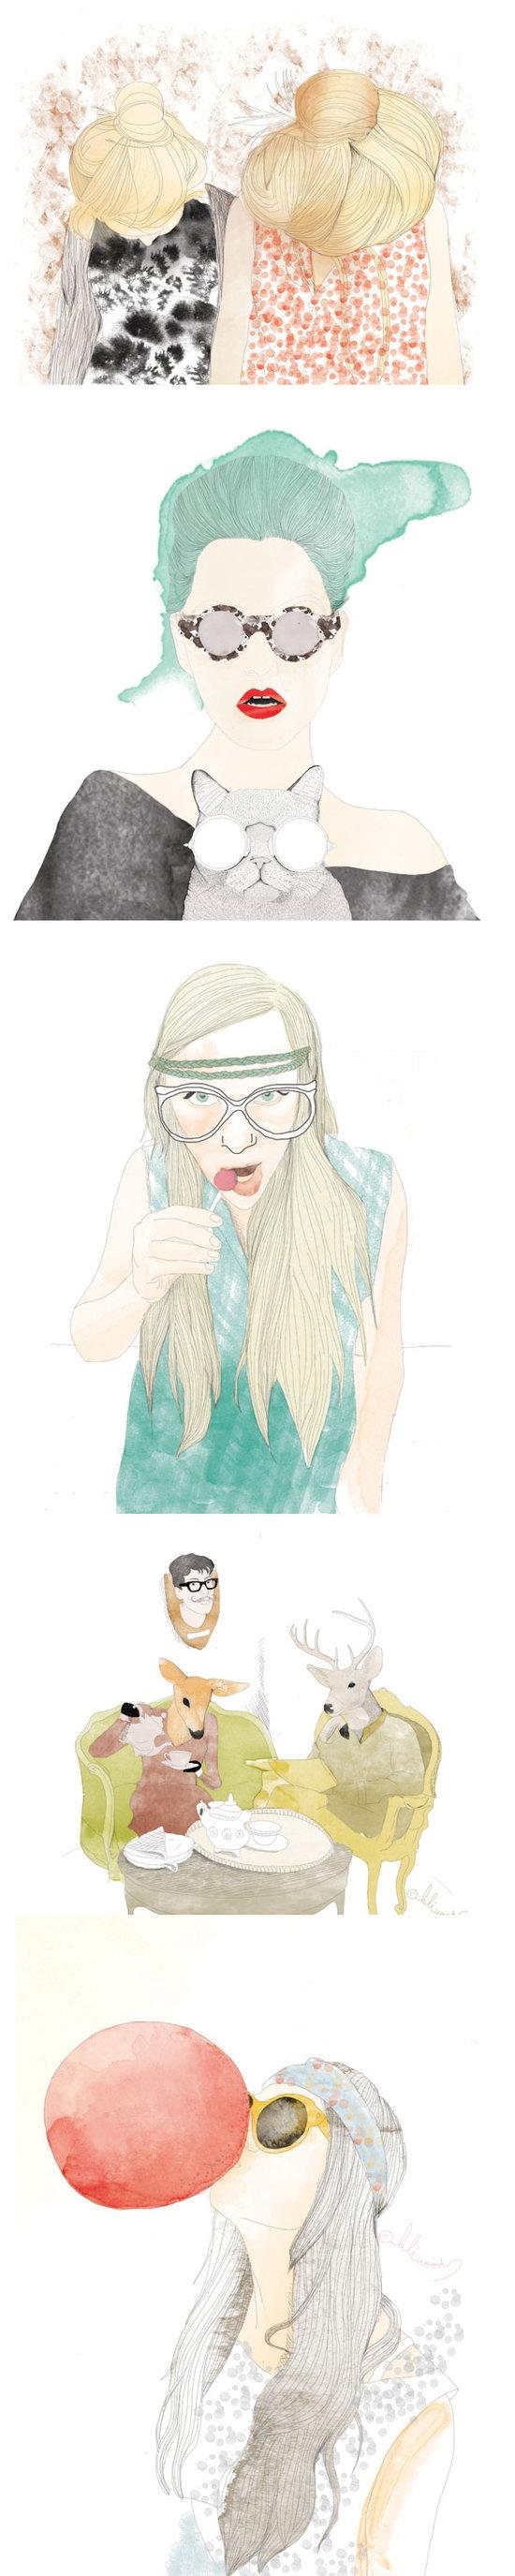 http://www.boumbang.com/lili-wood/ Lili Wood, Illustration ©